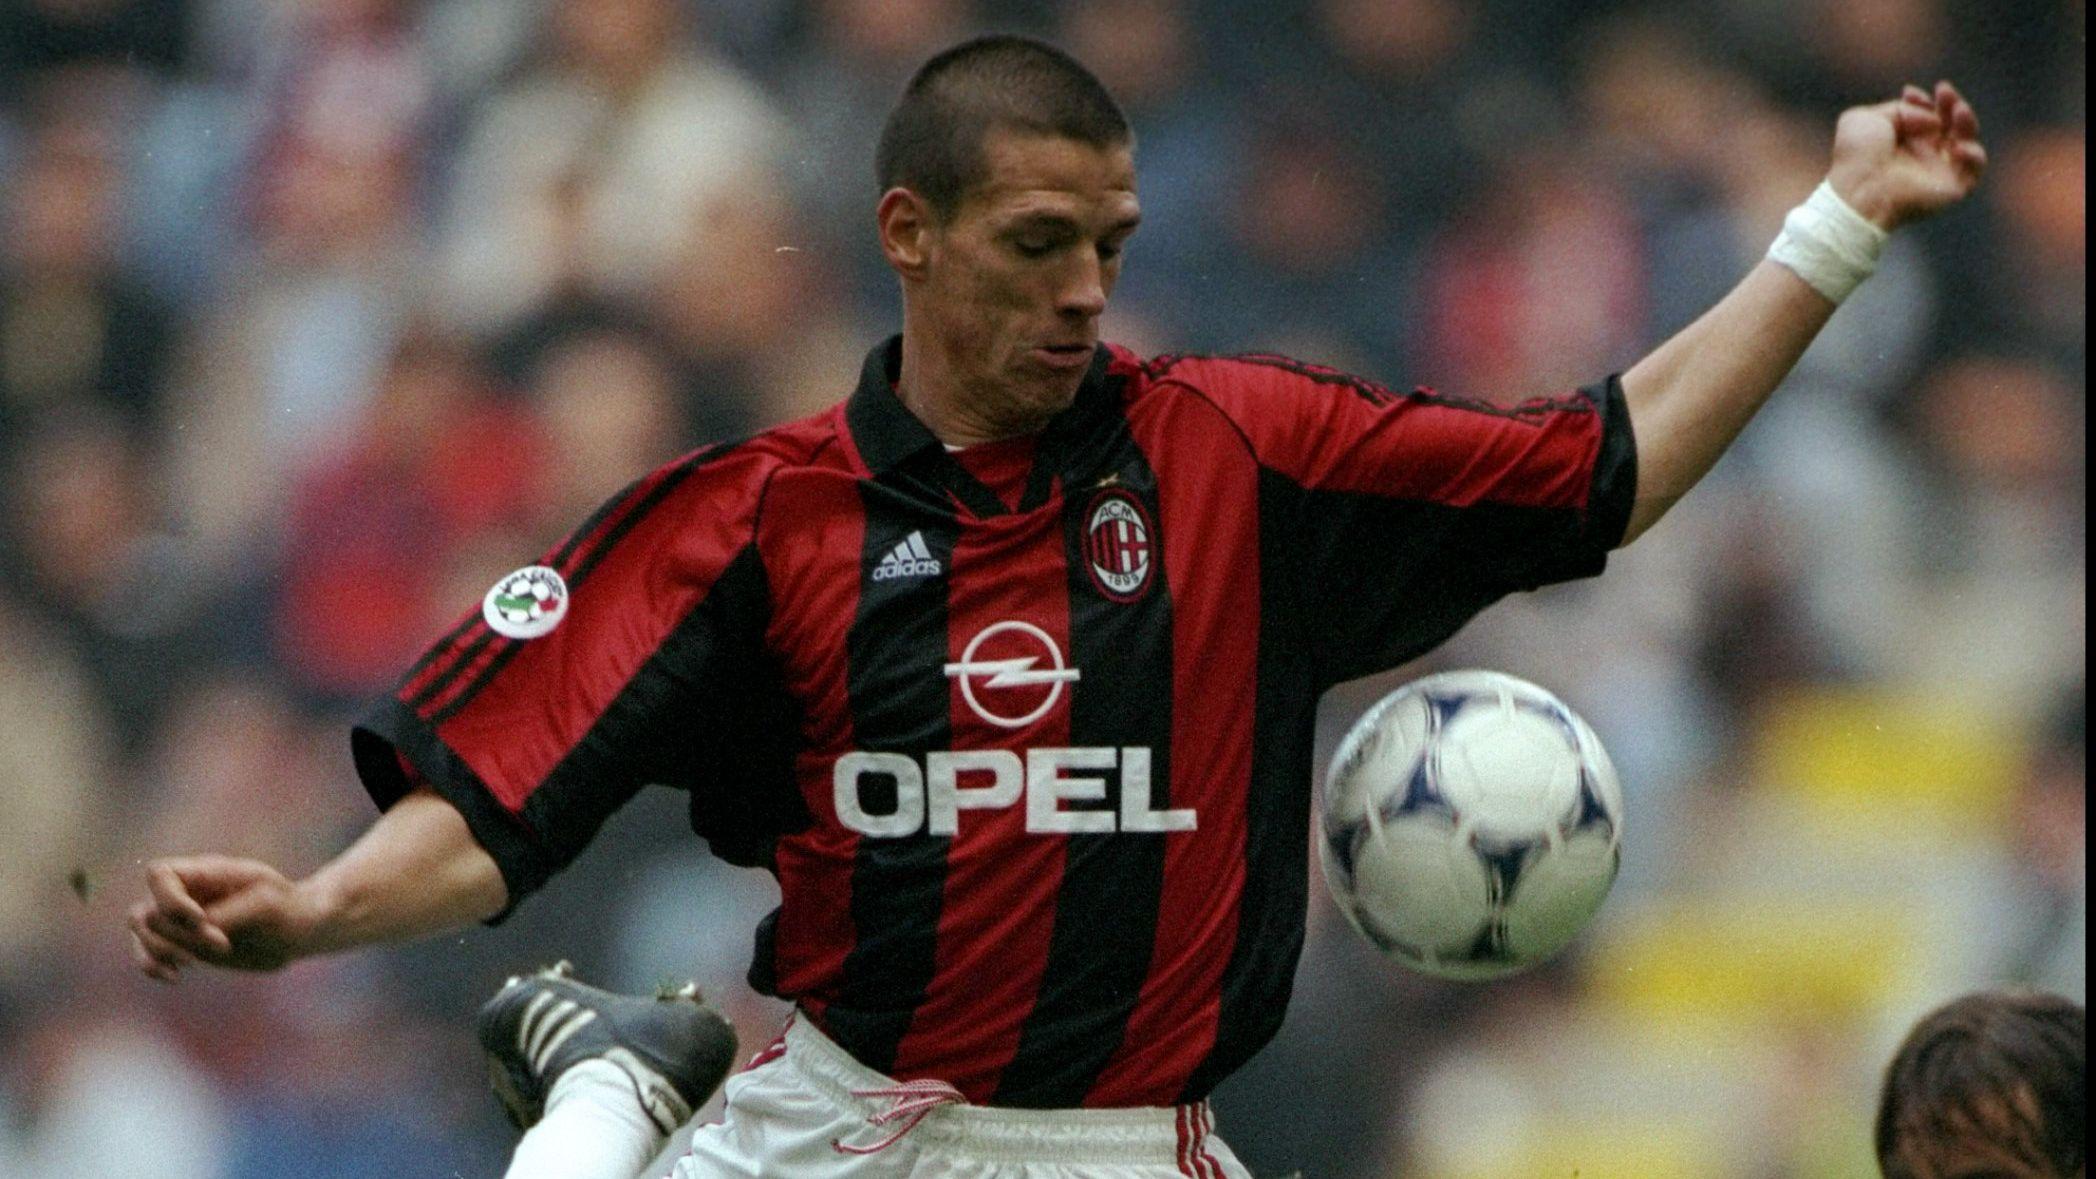 Da Kluivert a Kalinic: gli acquisti flop del Milan   Goal.com